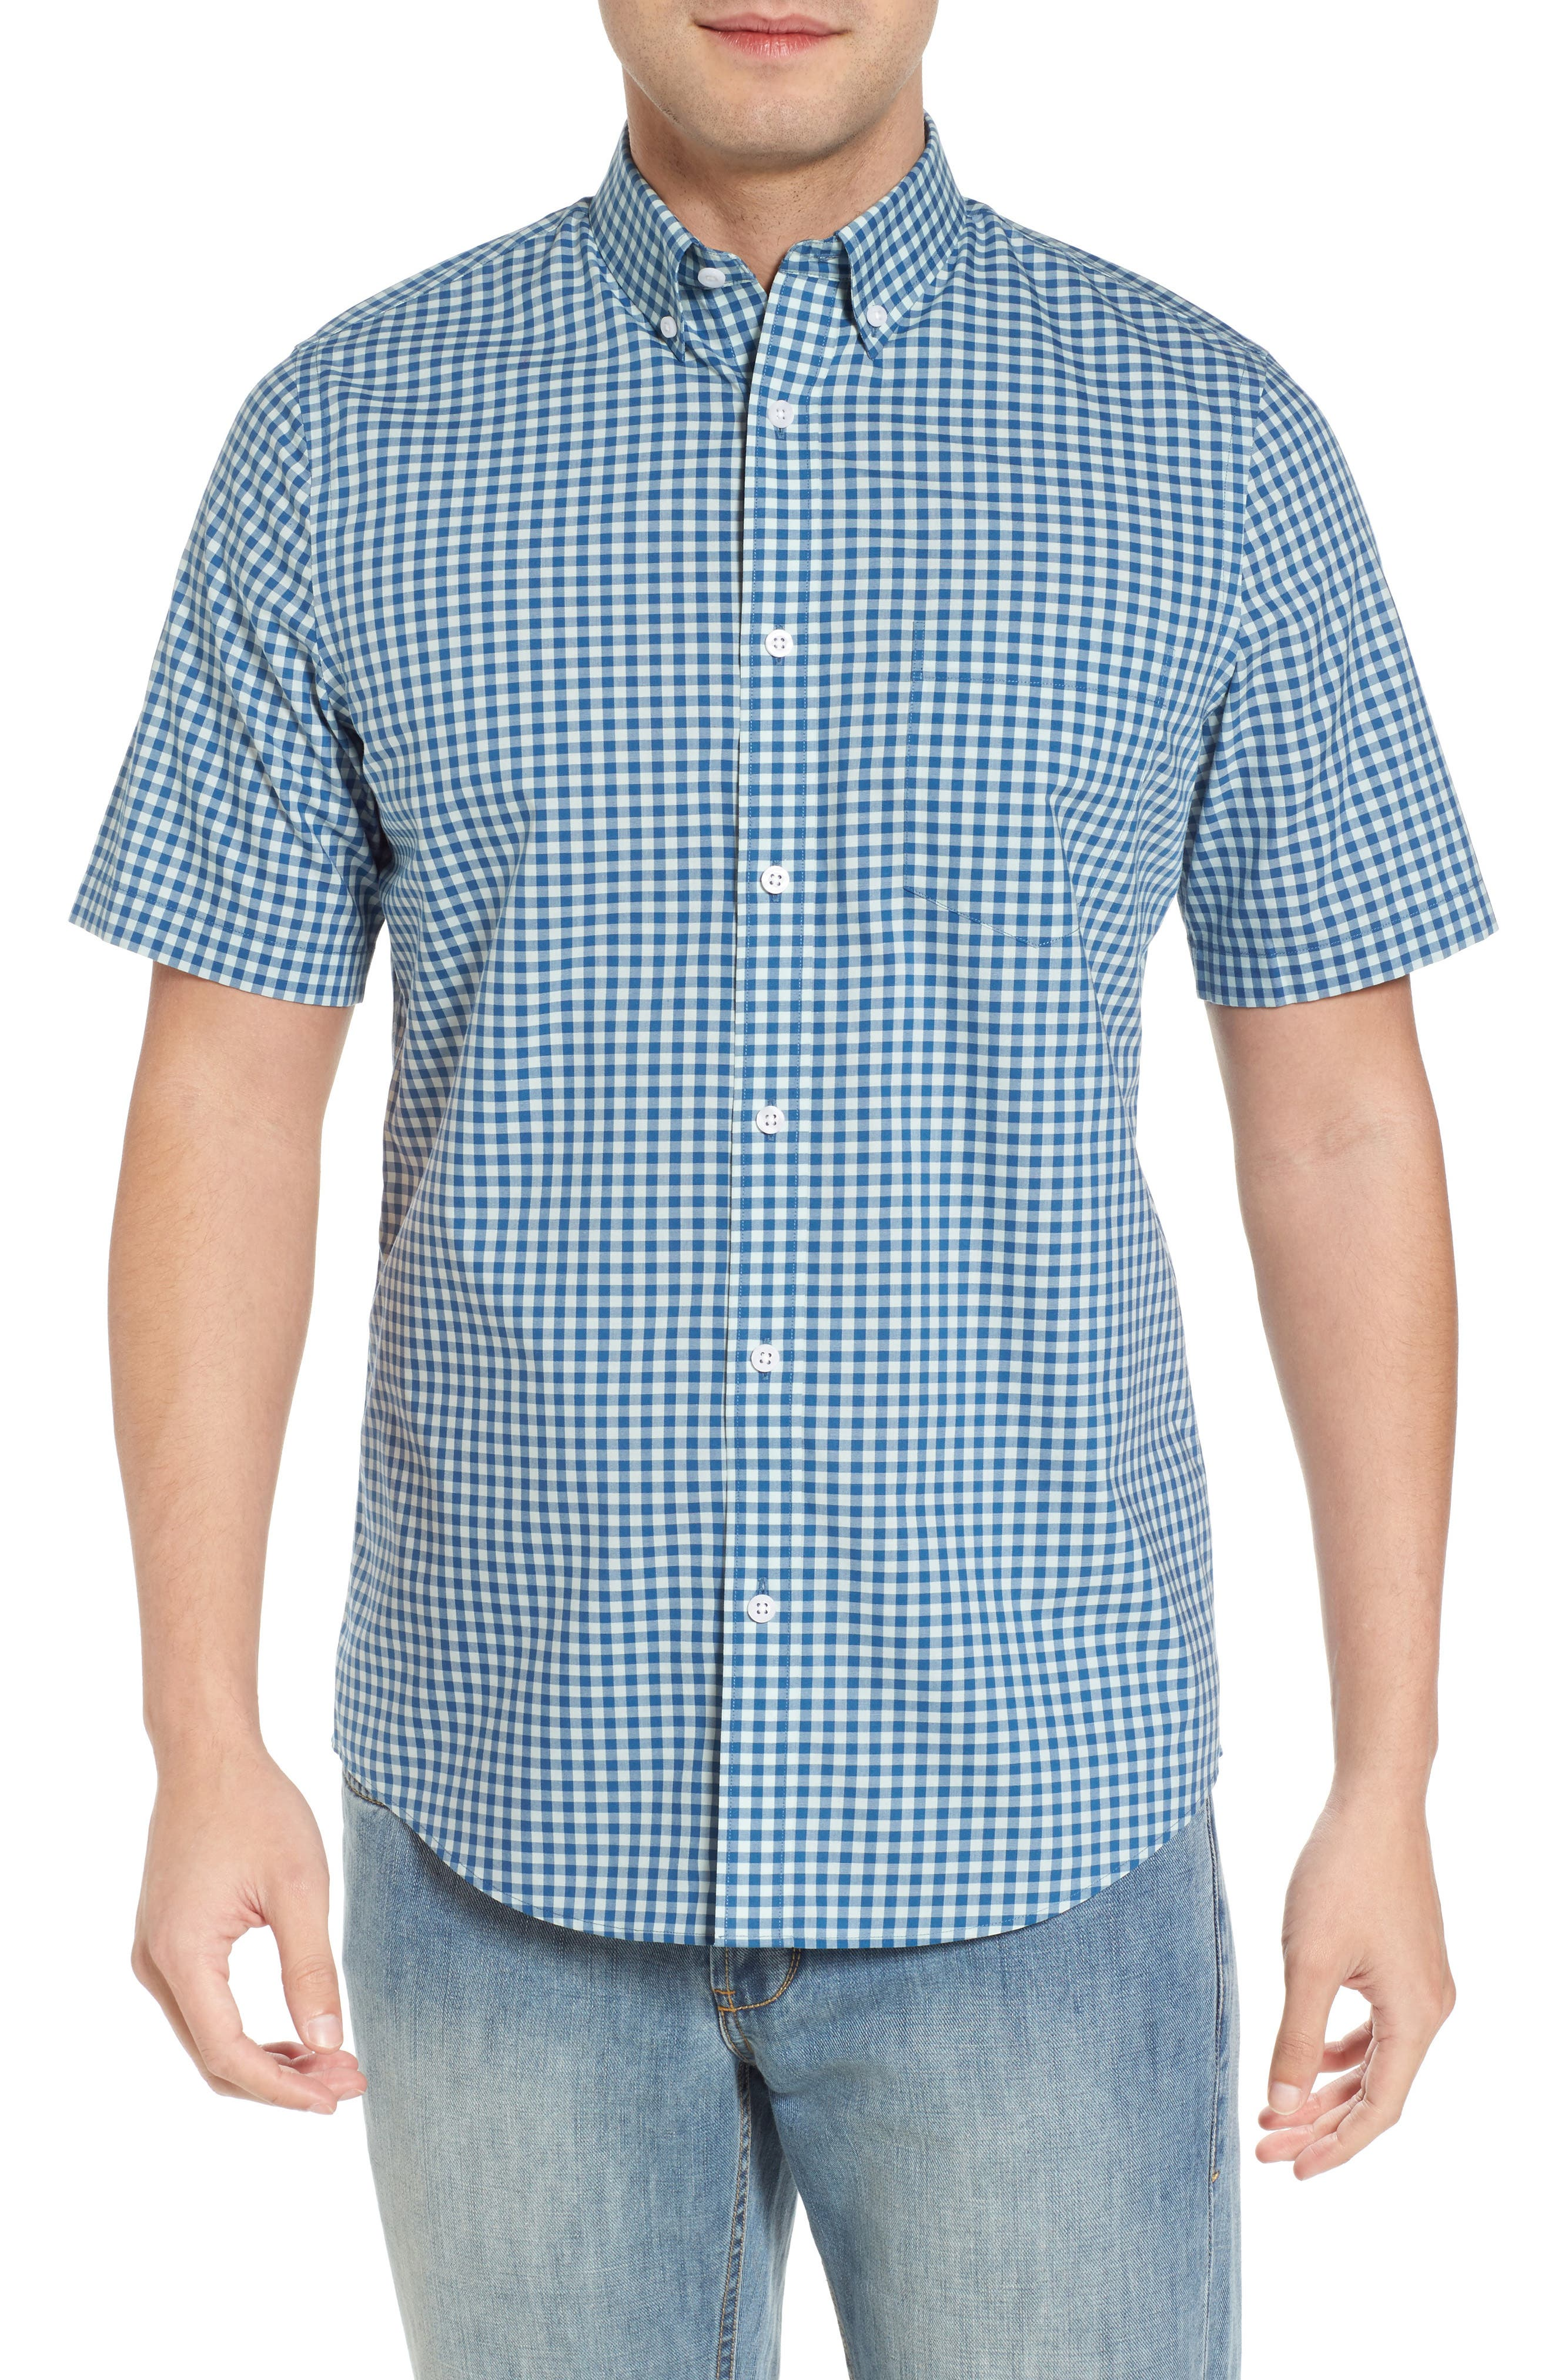 Regular Fit Gingham Sport Shirt,                             Main thumbnail 1, color,                             Teal Surf Blue Gingham